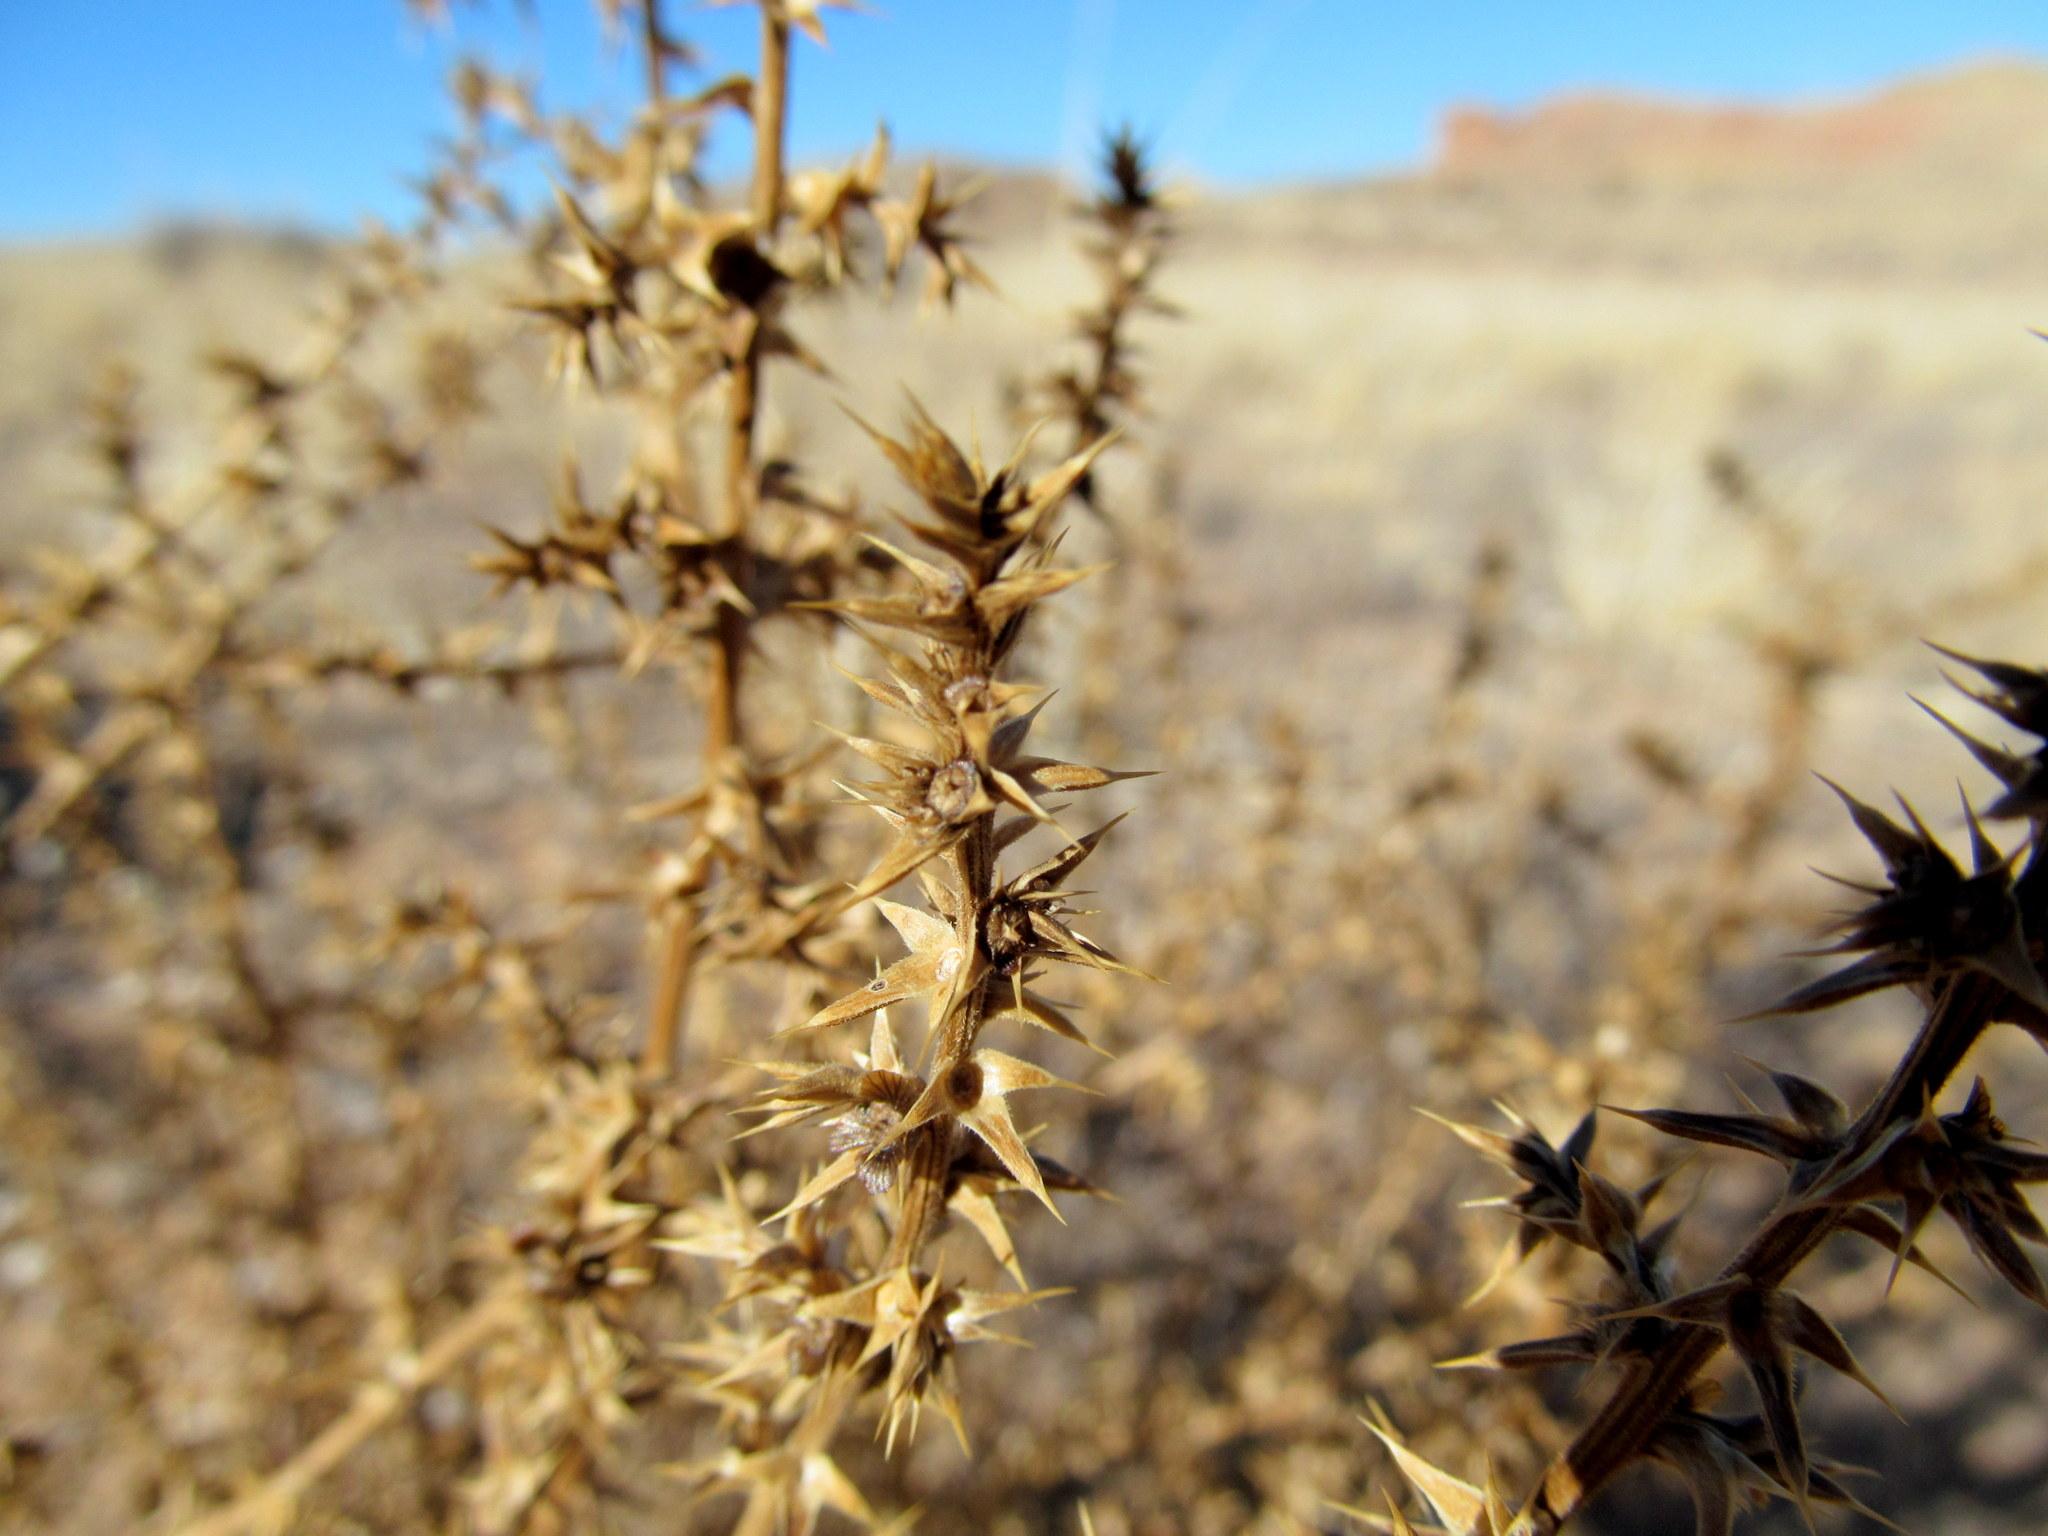 Photo: Stickery weeds